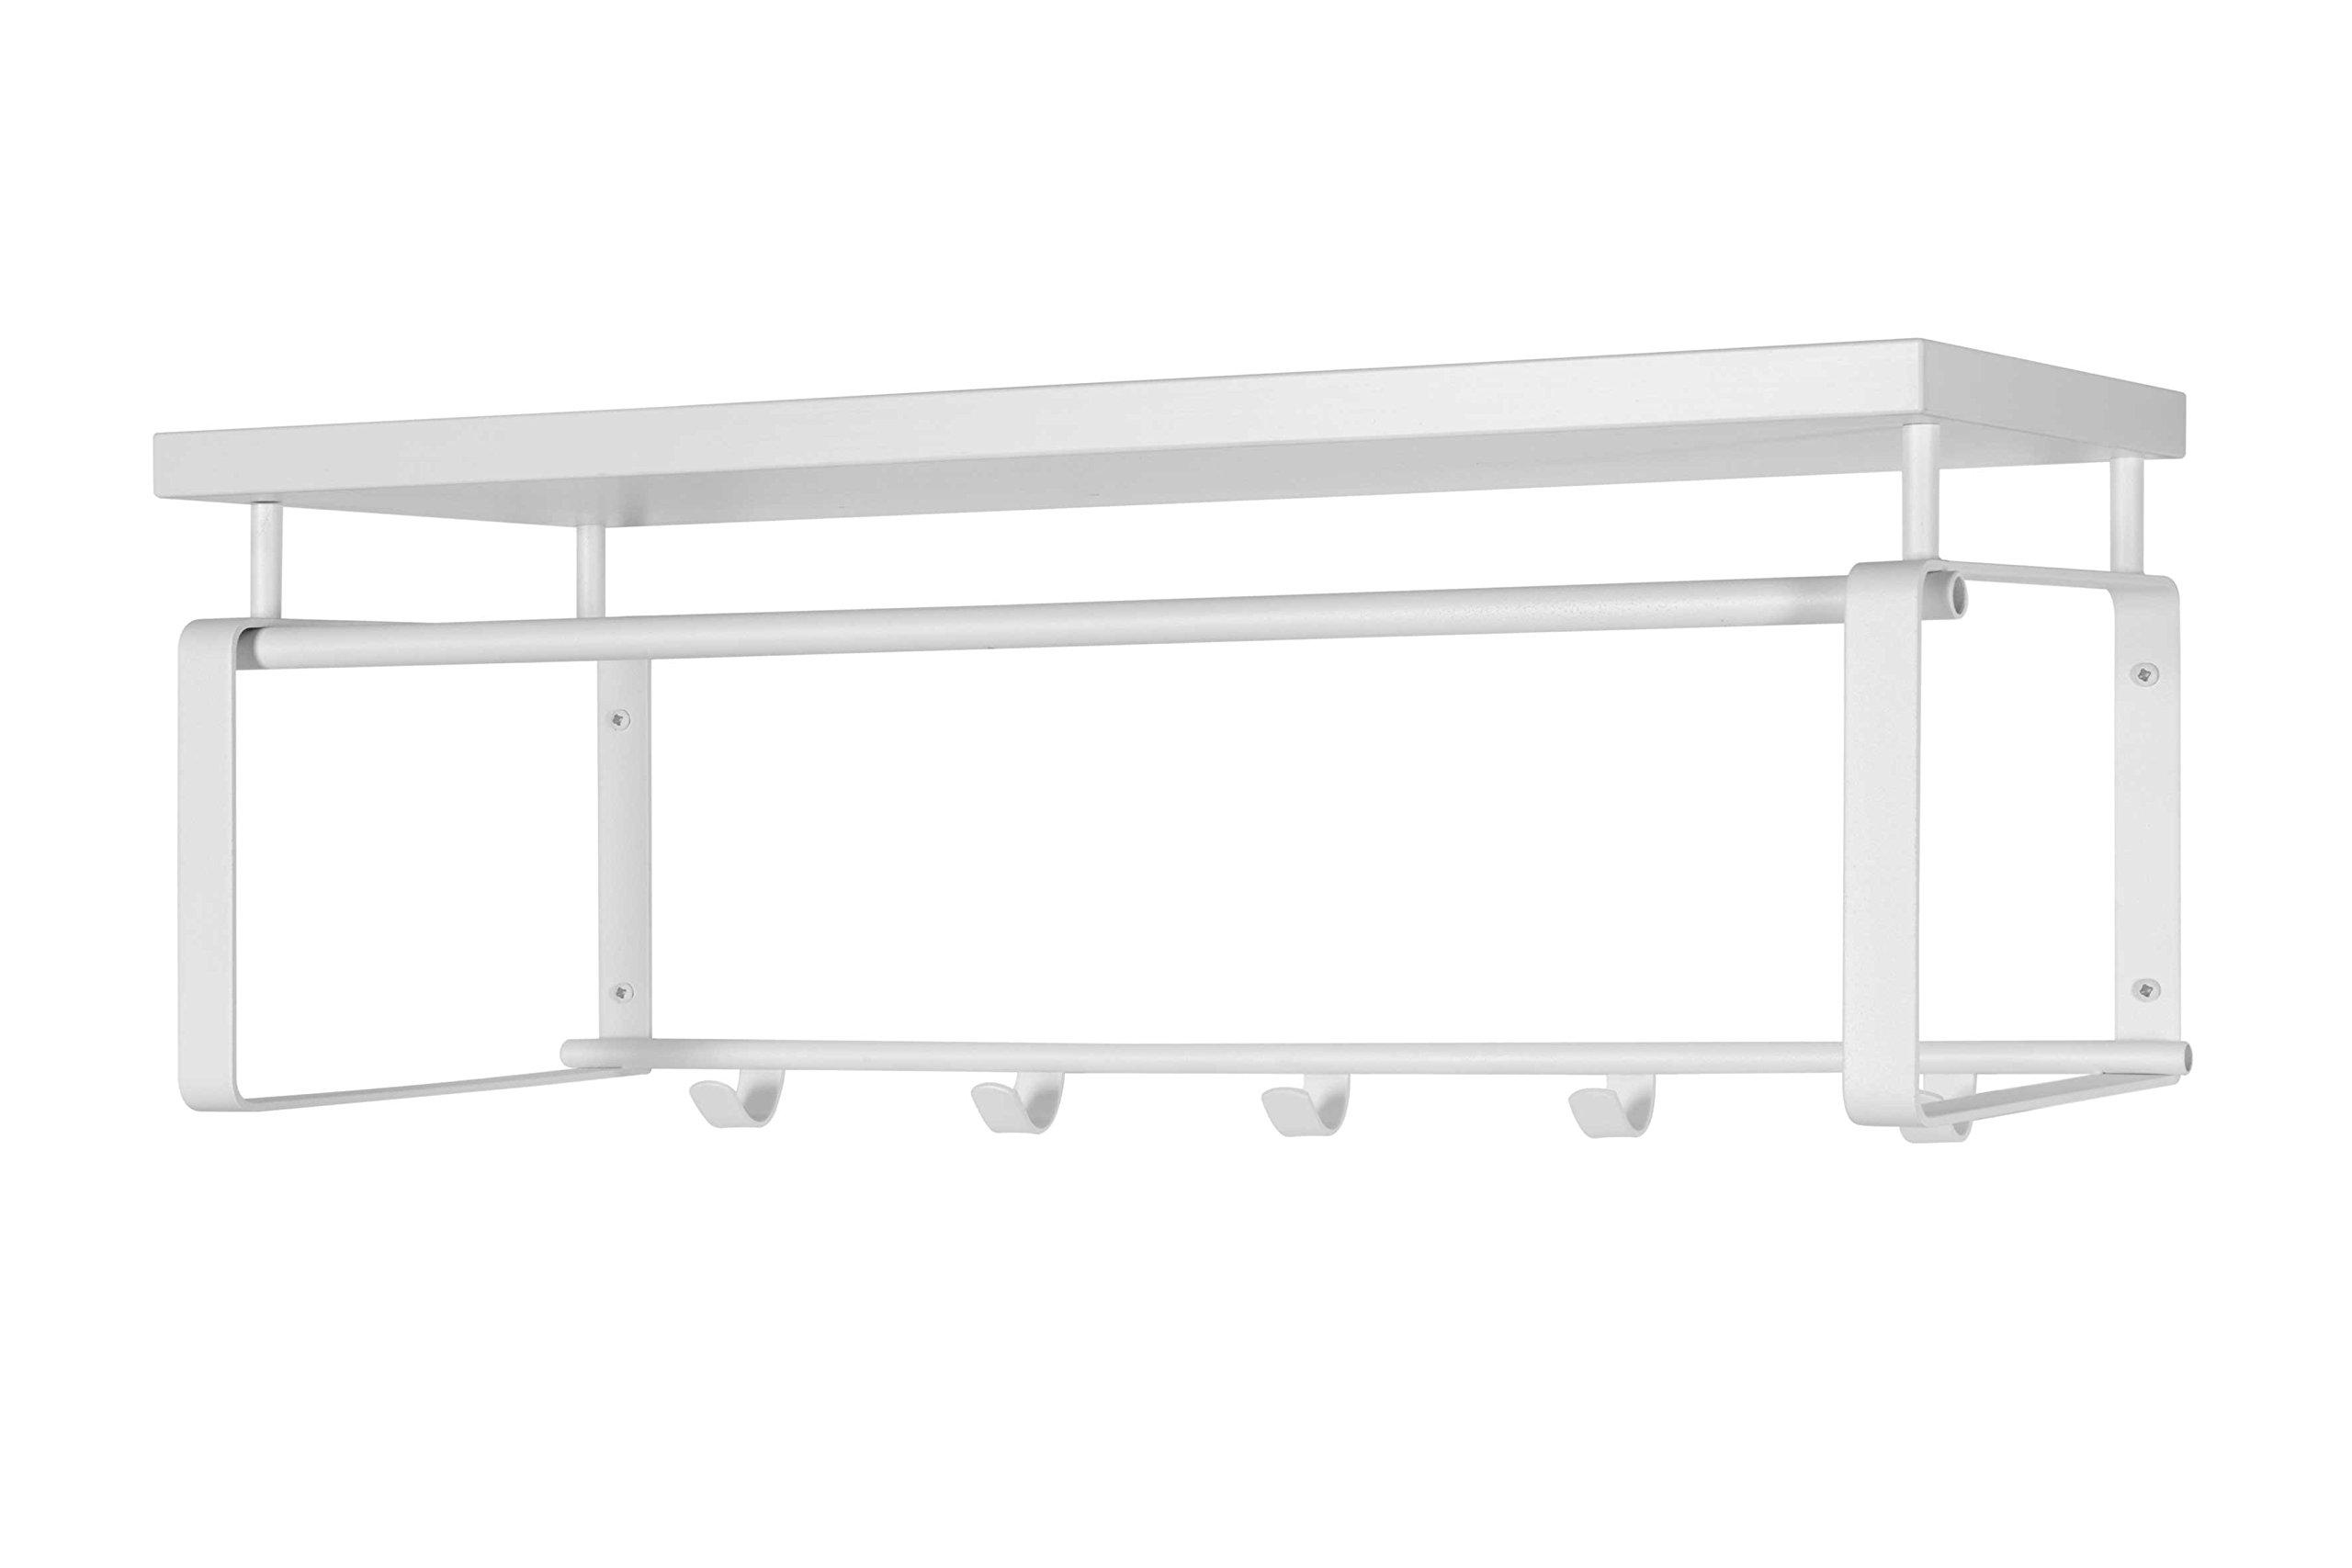 SB-Design 441-001 Porte-manteaux SPOT 72 x 35 x 29.5 cm Blanc